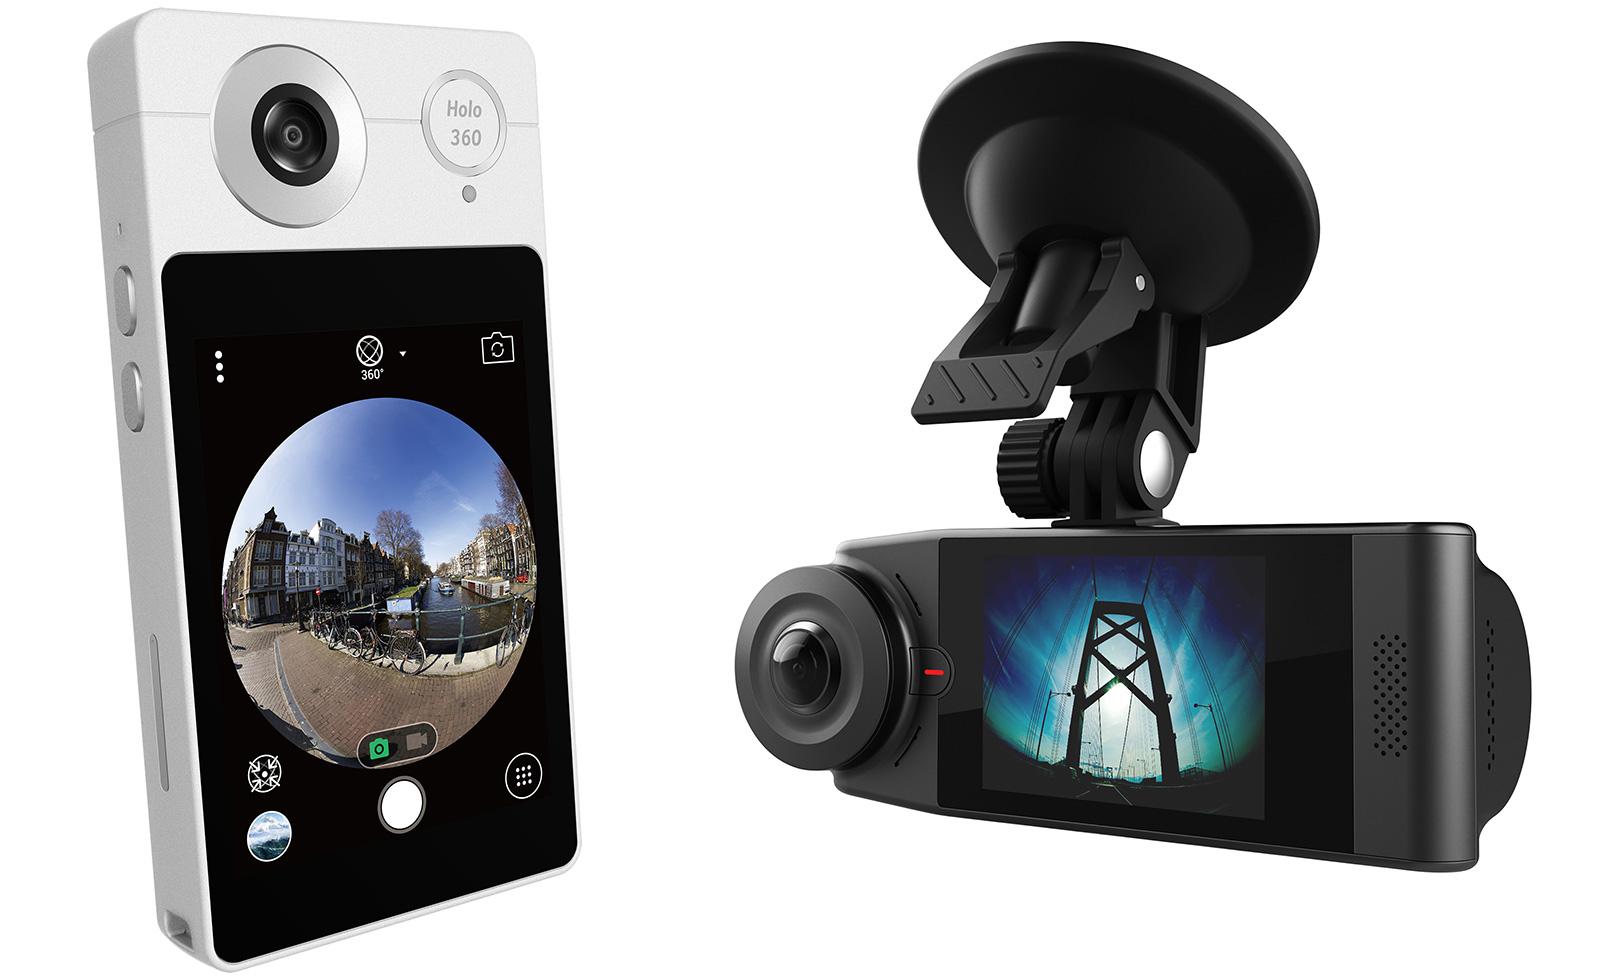 Holo360-Vision360